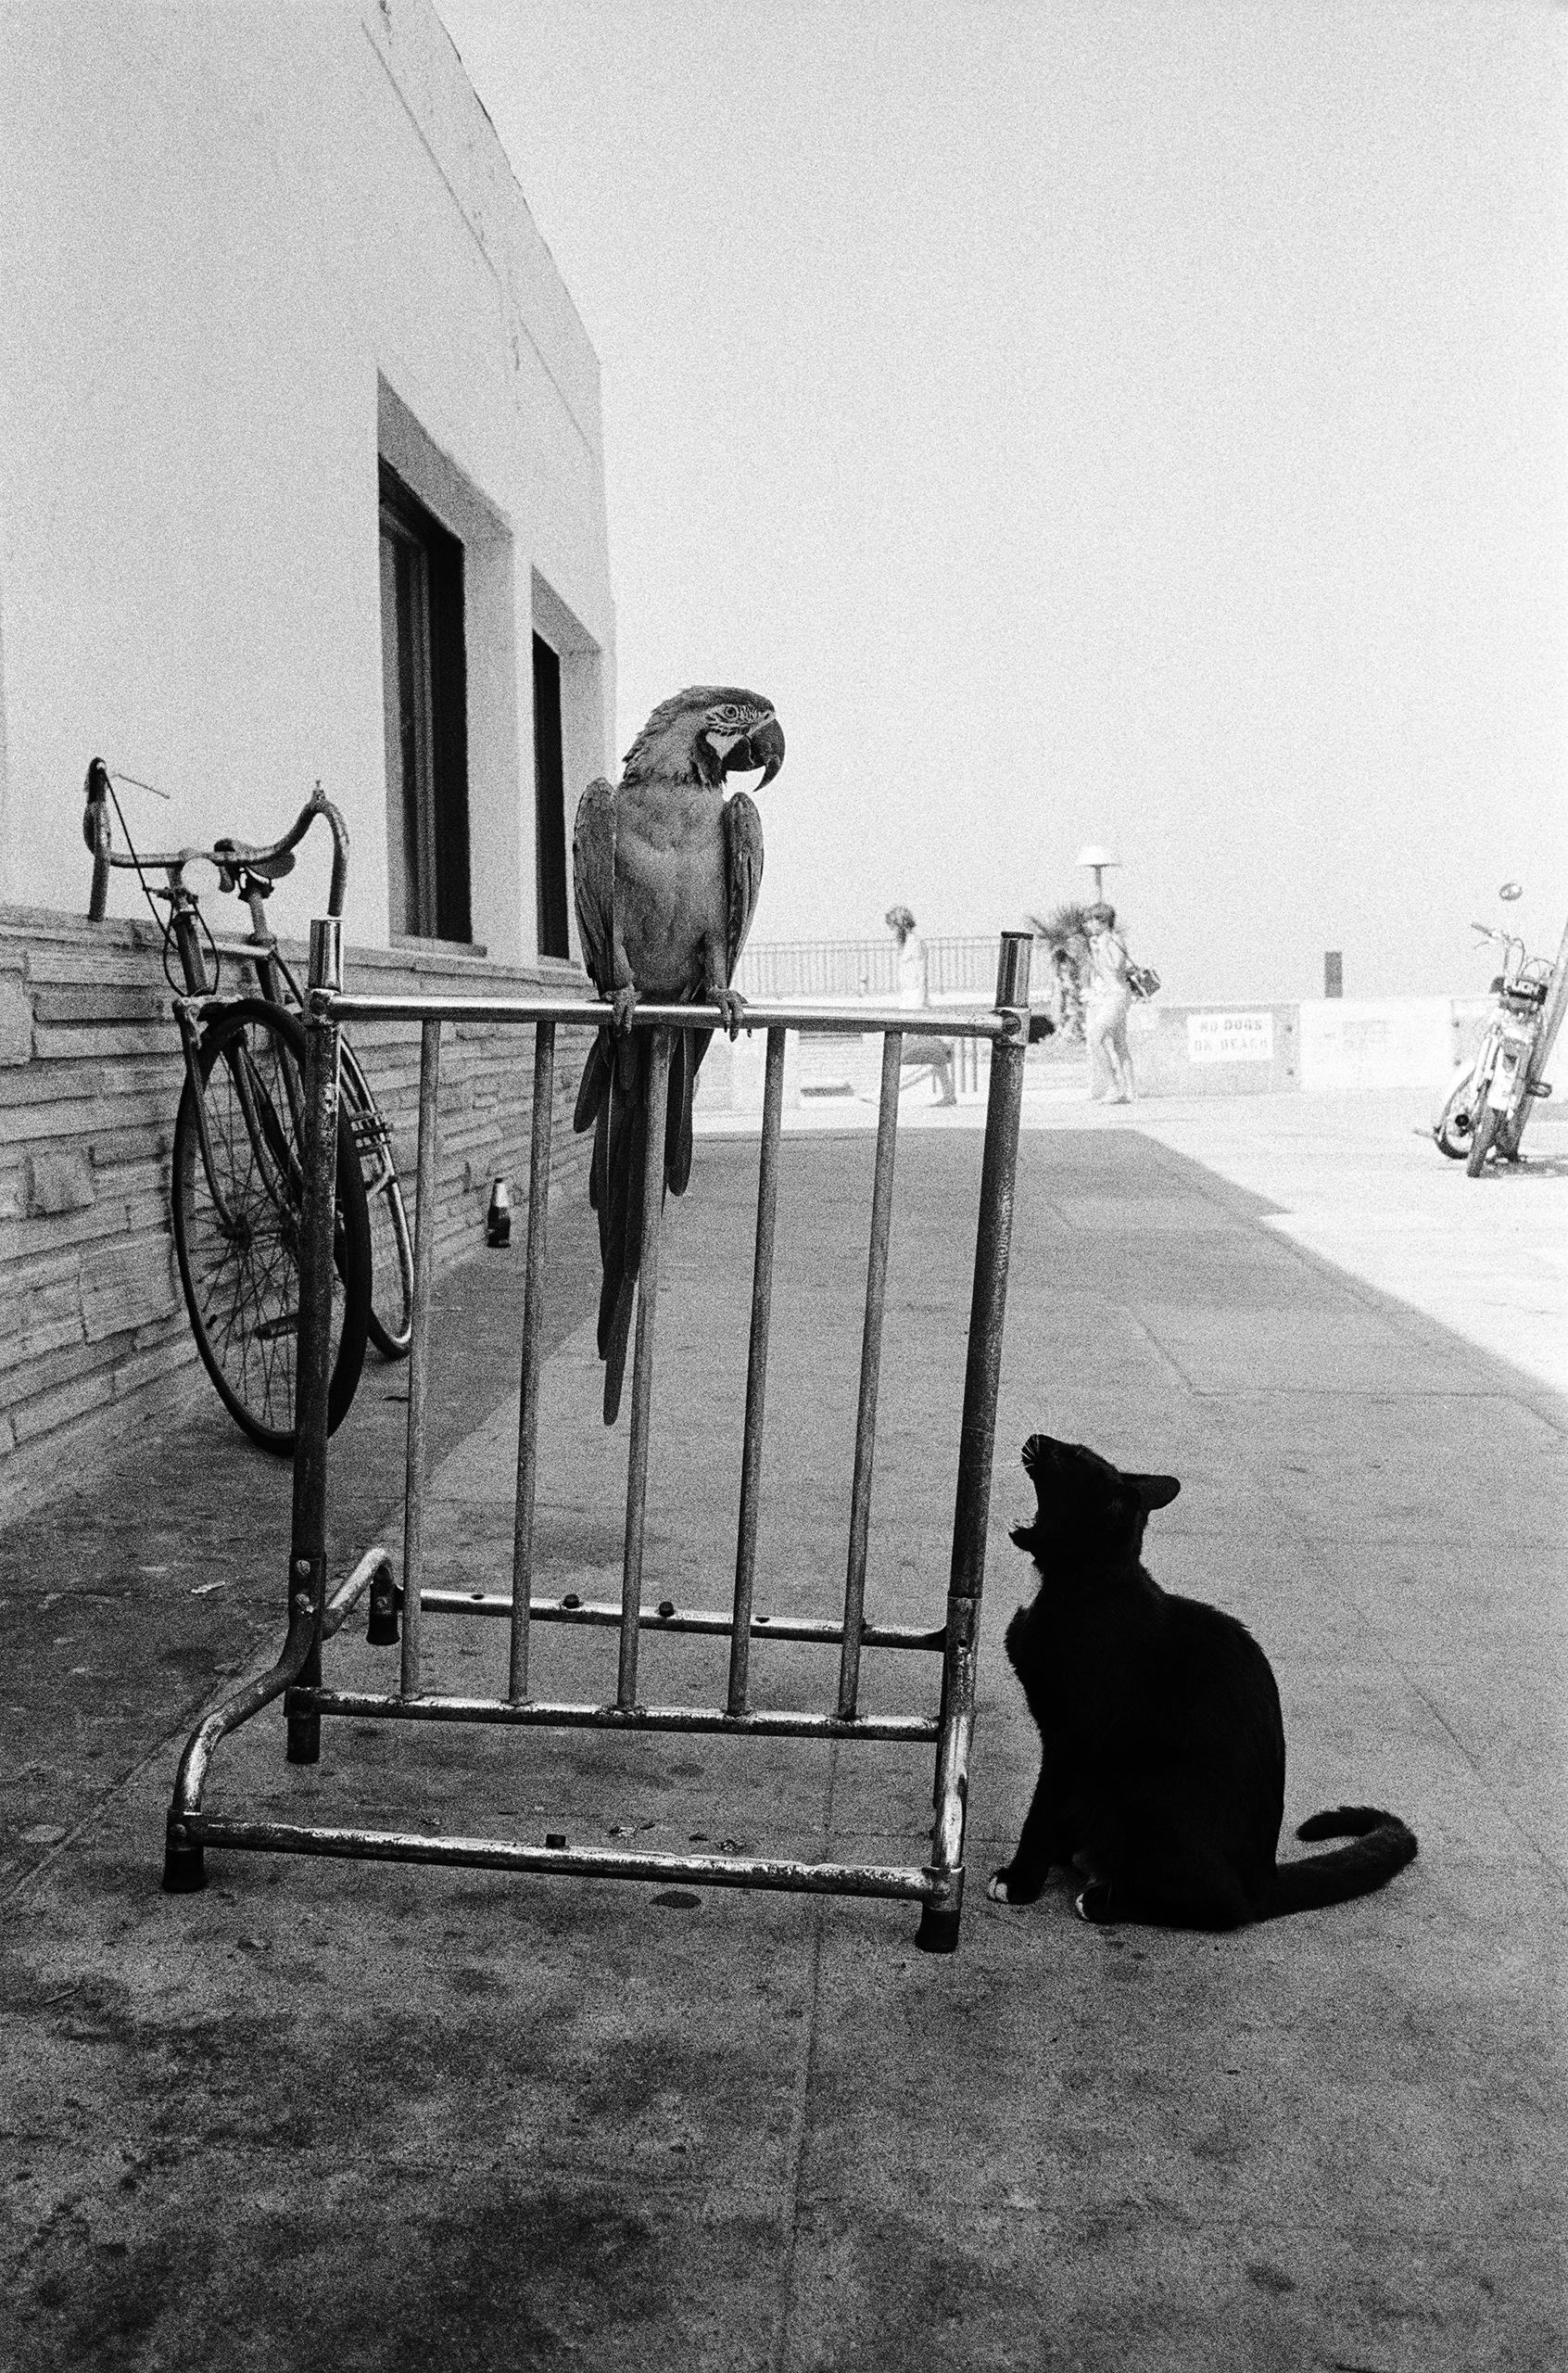 Bird & cat; Surf Hut Cafe.